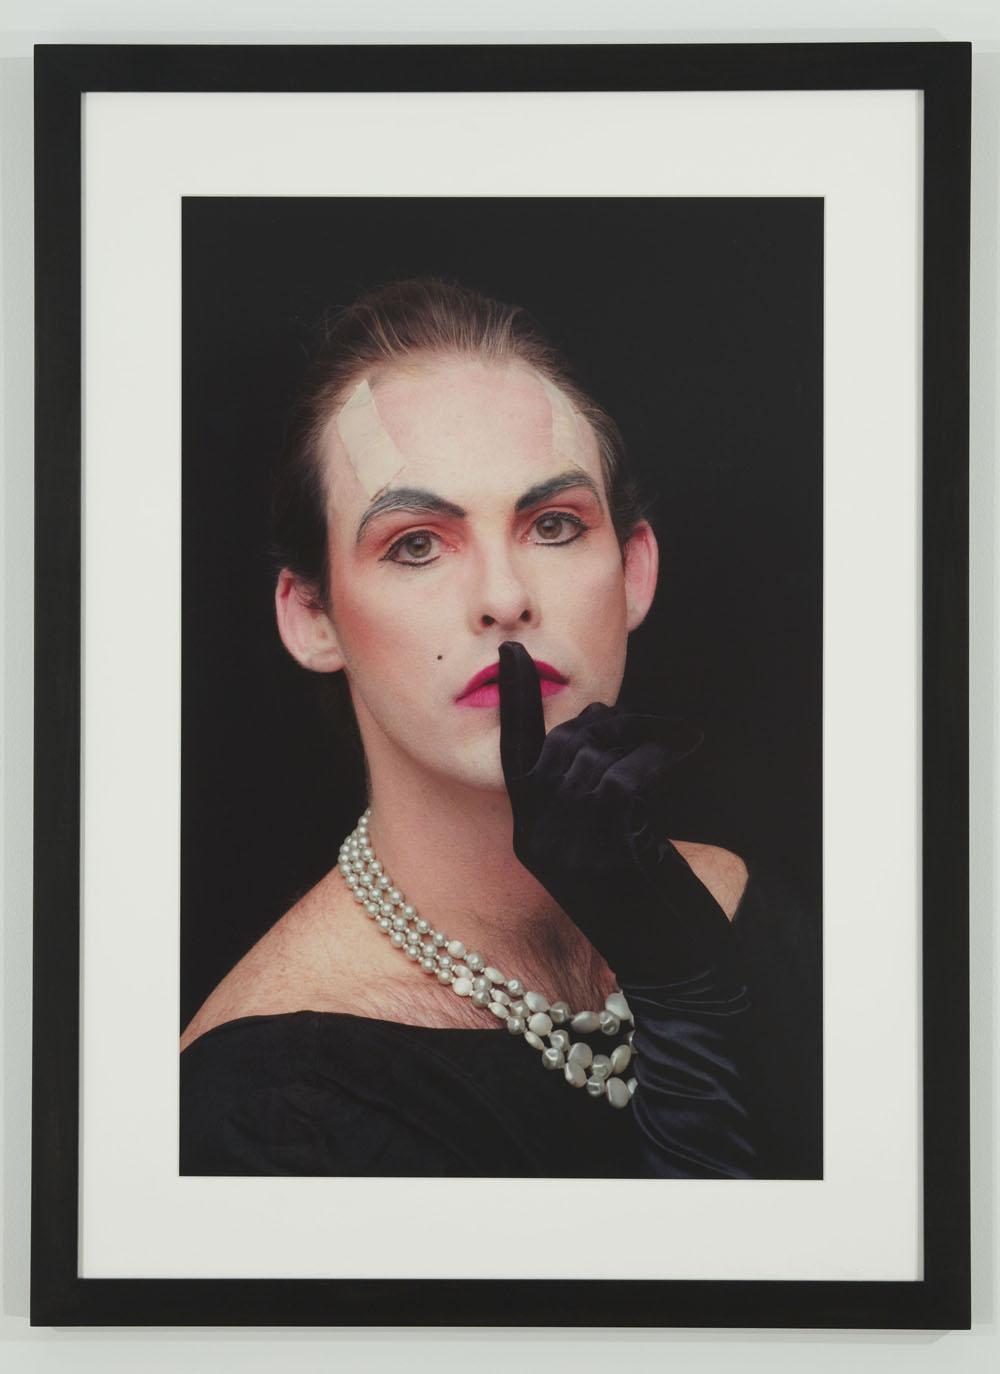 Hunter Reynolds, Shhh (from Patina du Prey Drag Pose Series), (1990/2012)